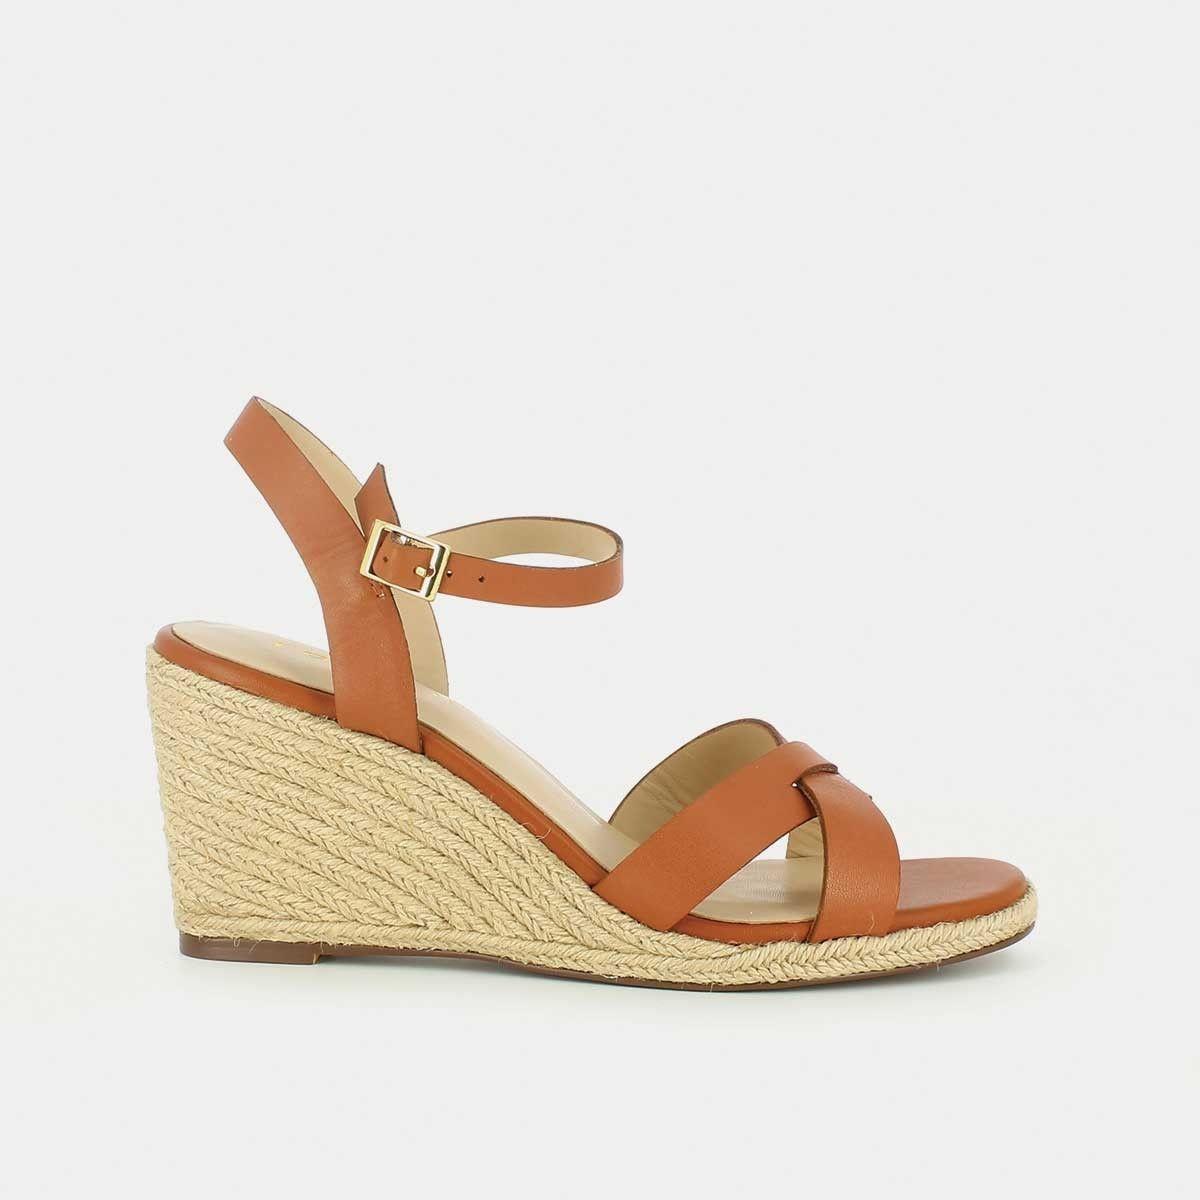 sandales talon compens en corde en cuir camel chameau. Black Bedroom Furniture Sets. Home Design Ideas